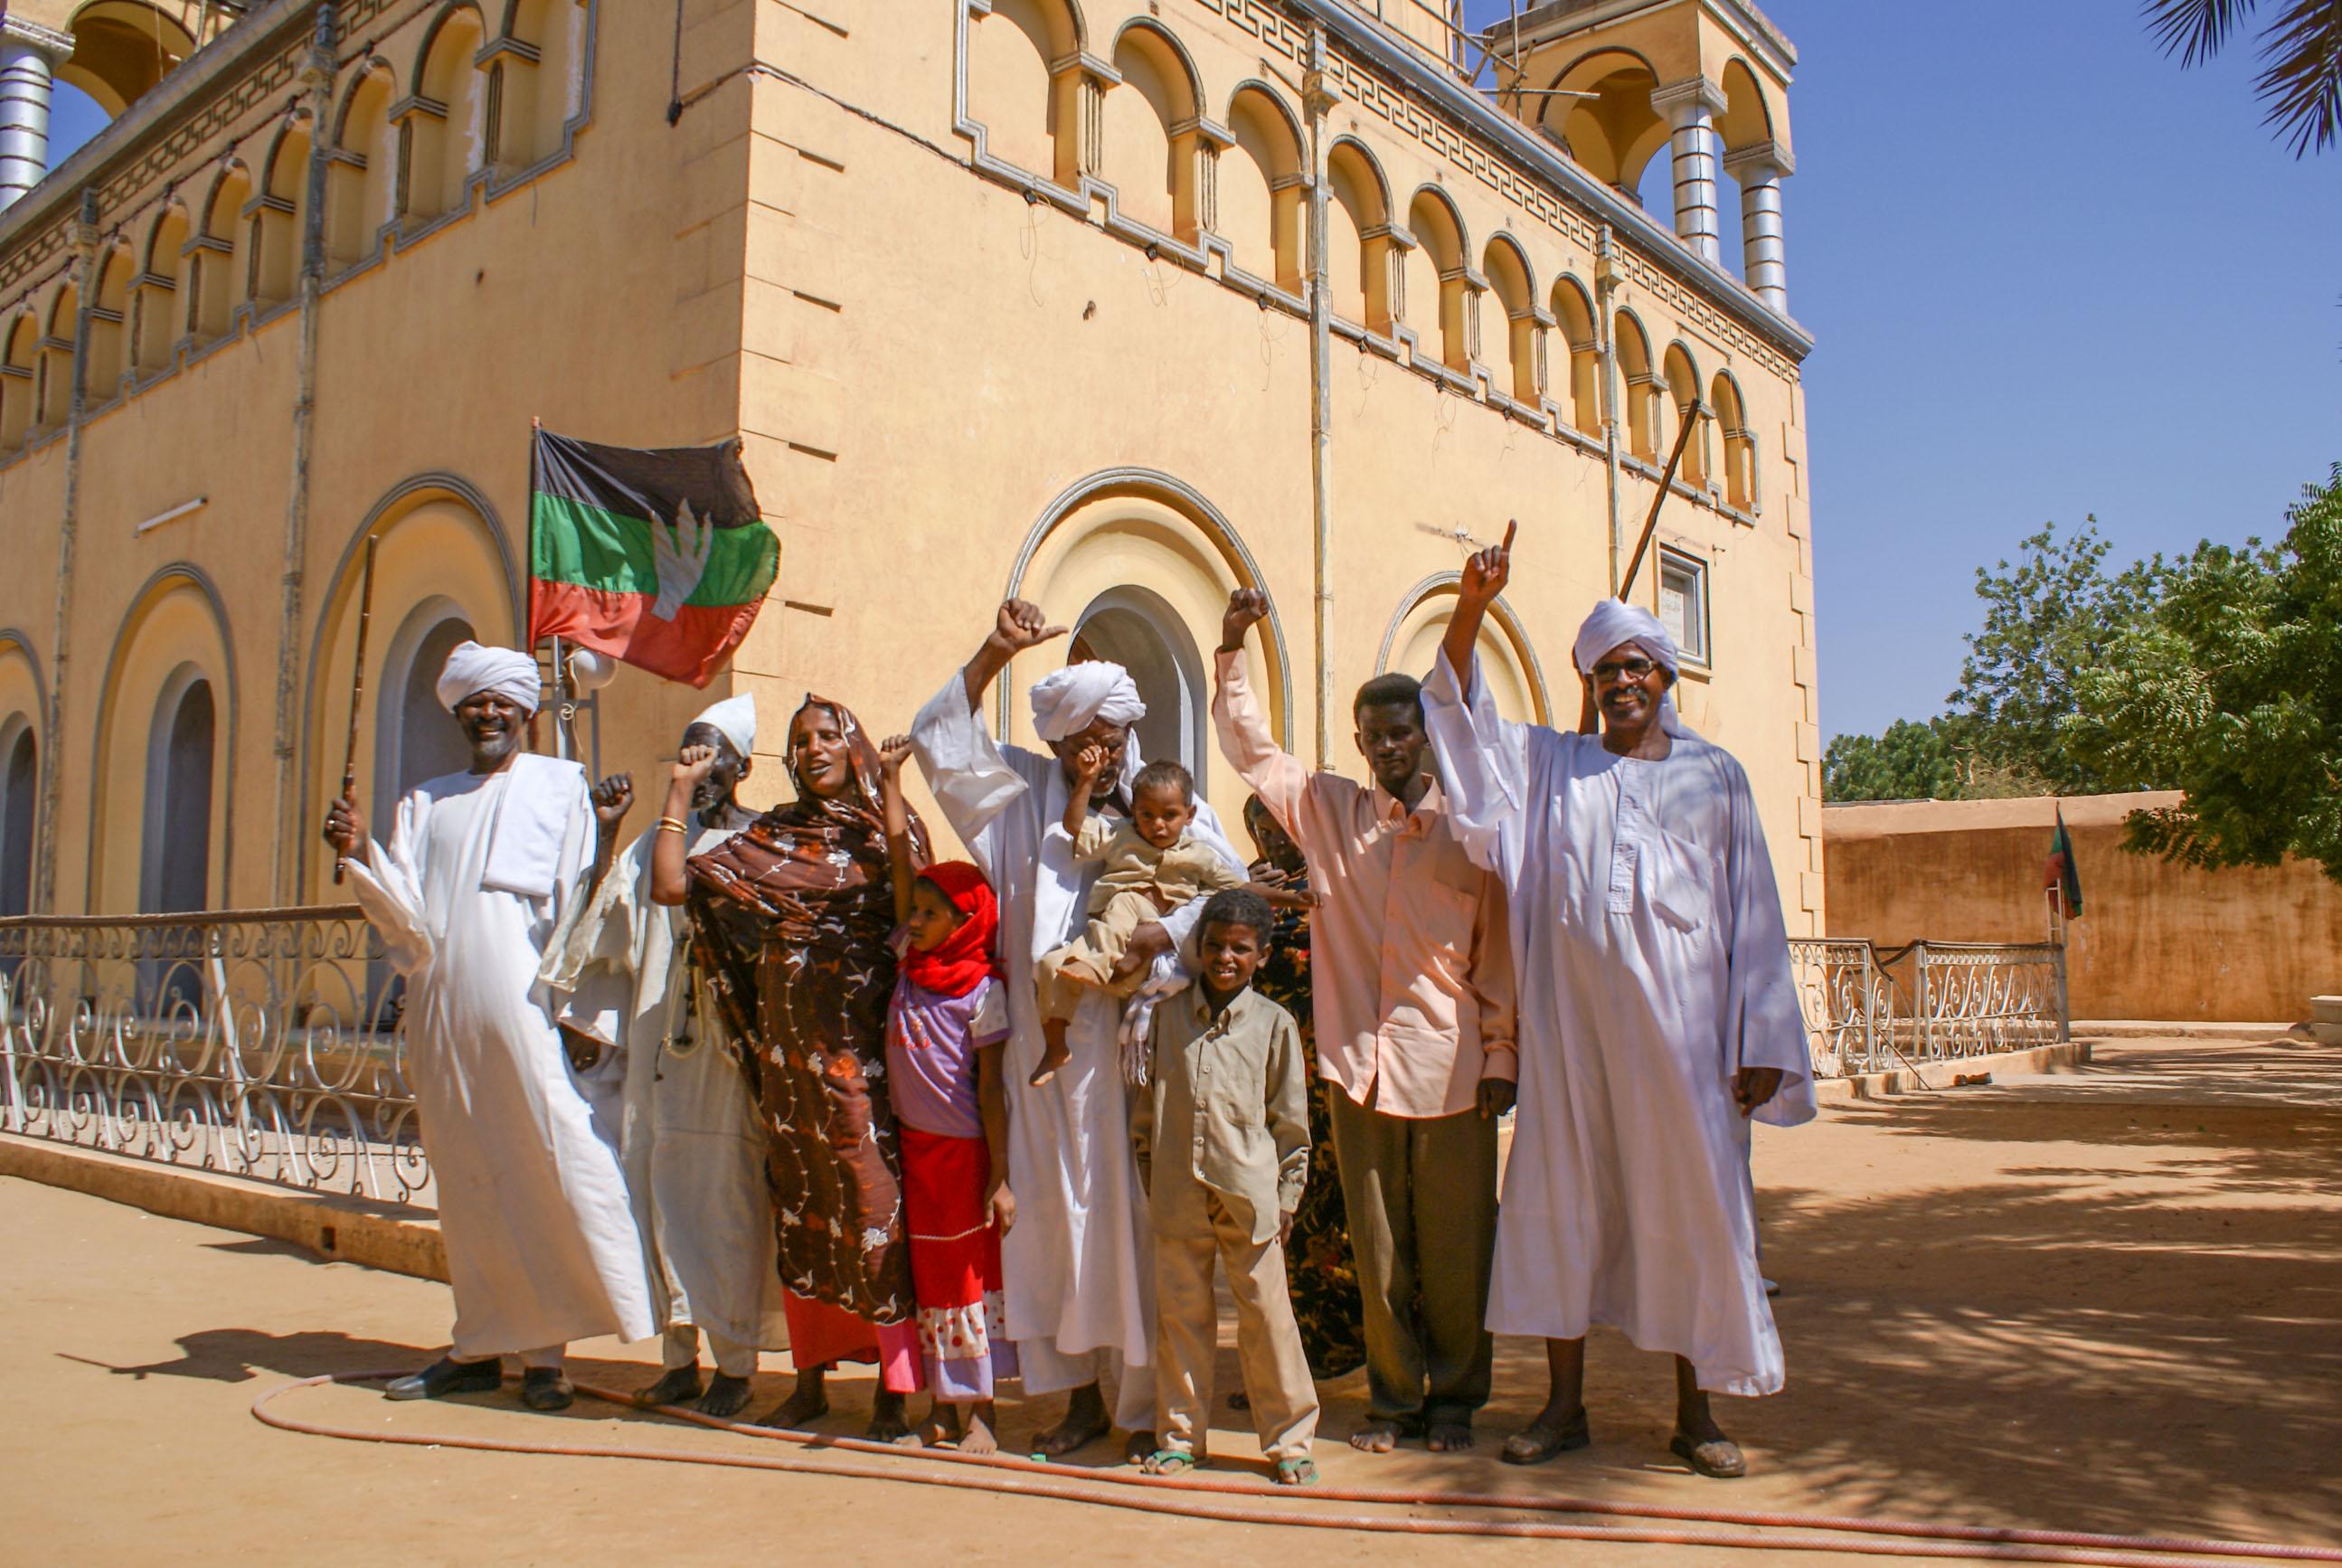 https://bubo.sk/uploads/galleries/17820/lubosfellner_sudan_dsc08163.jpg